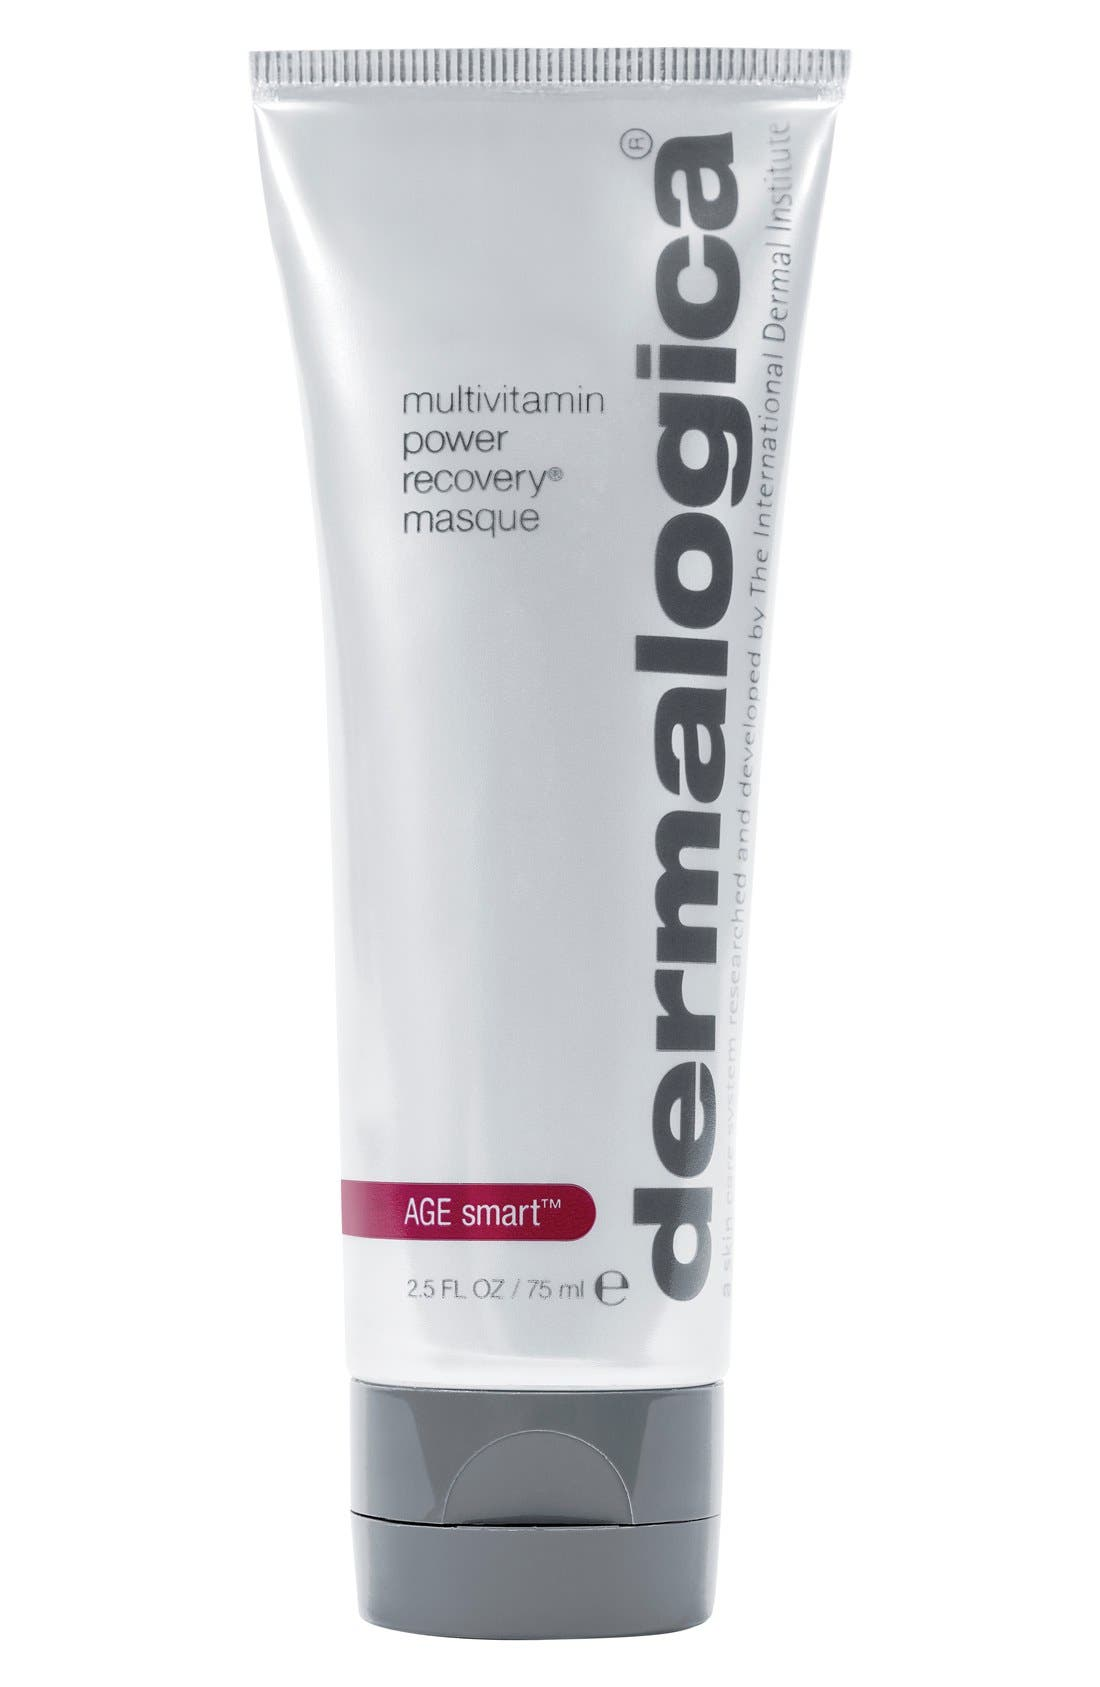 dermalogica® Multivitamin Power Recovery Masque